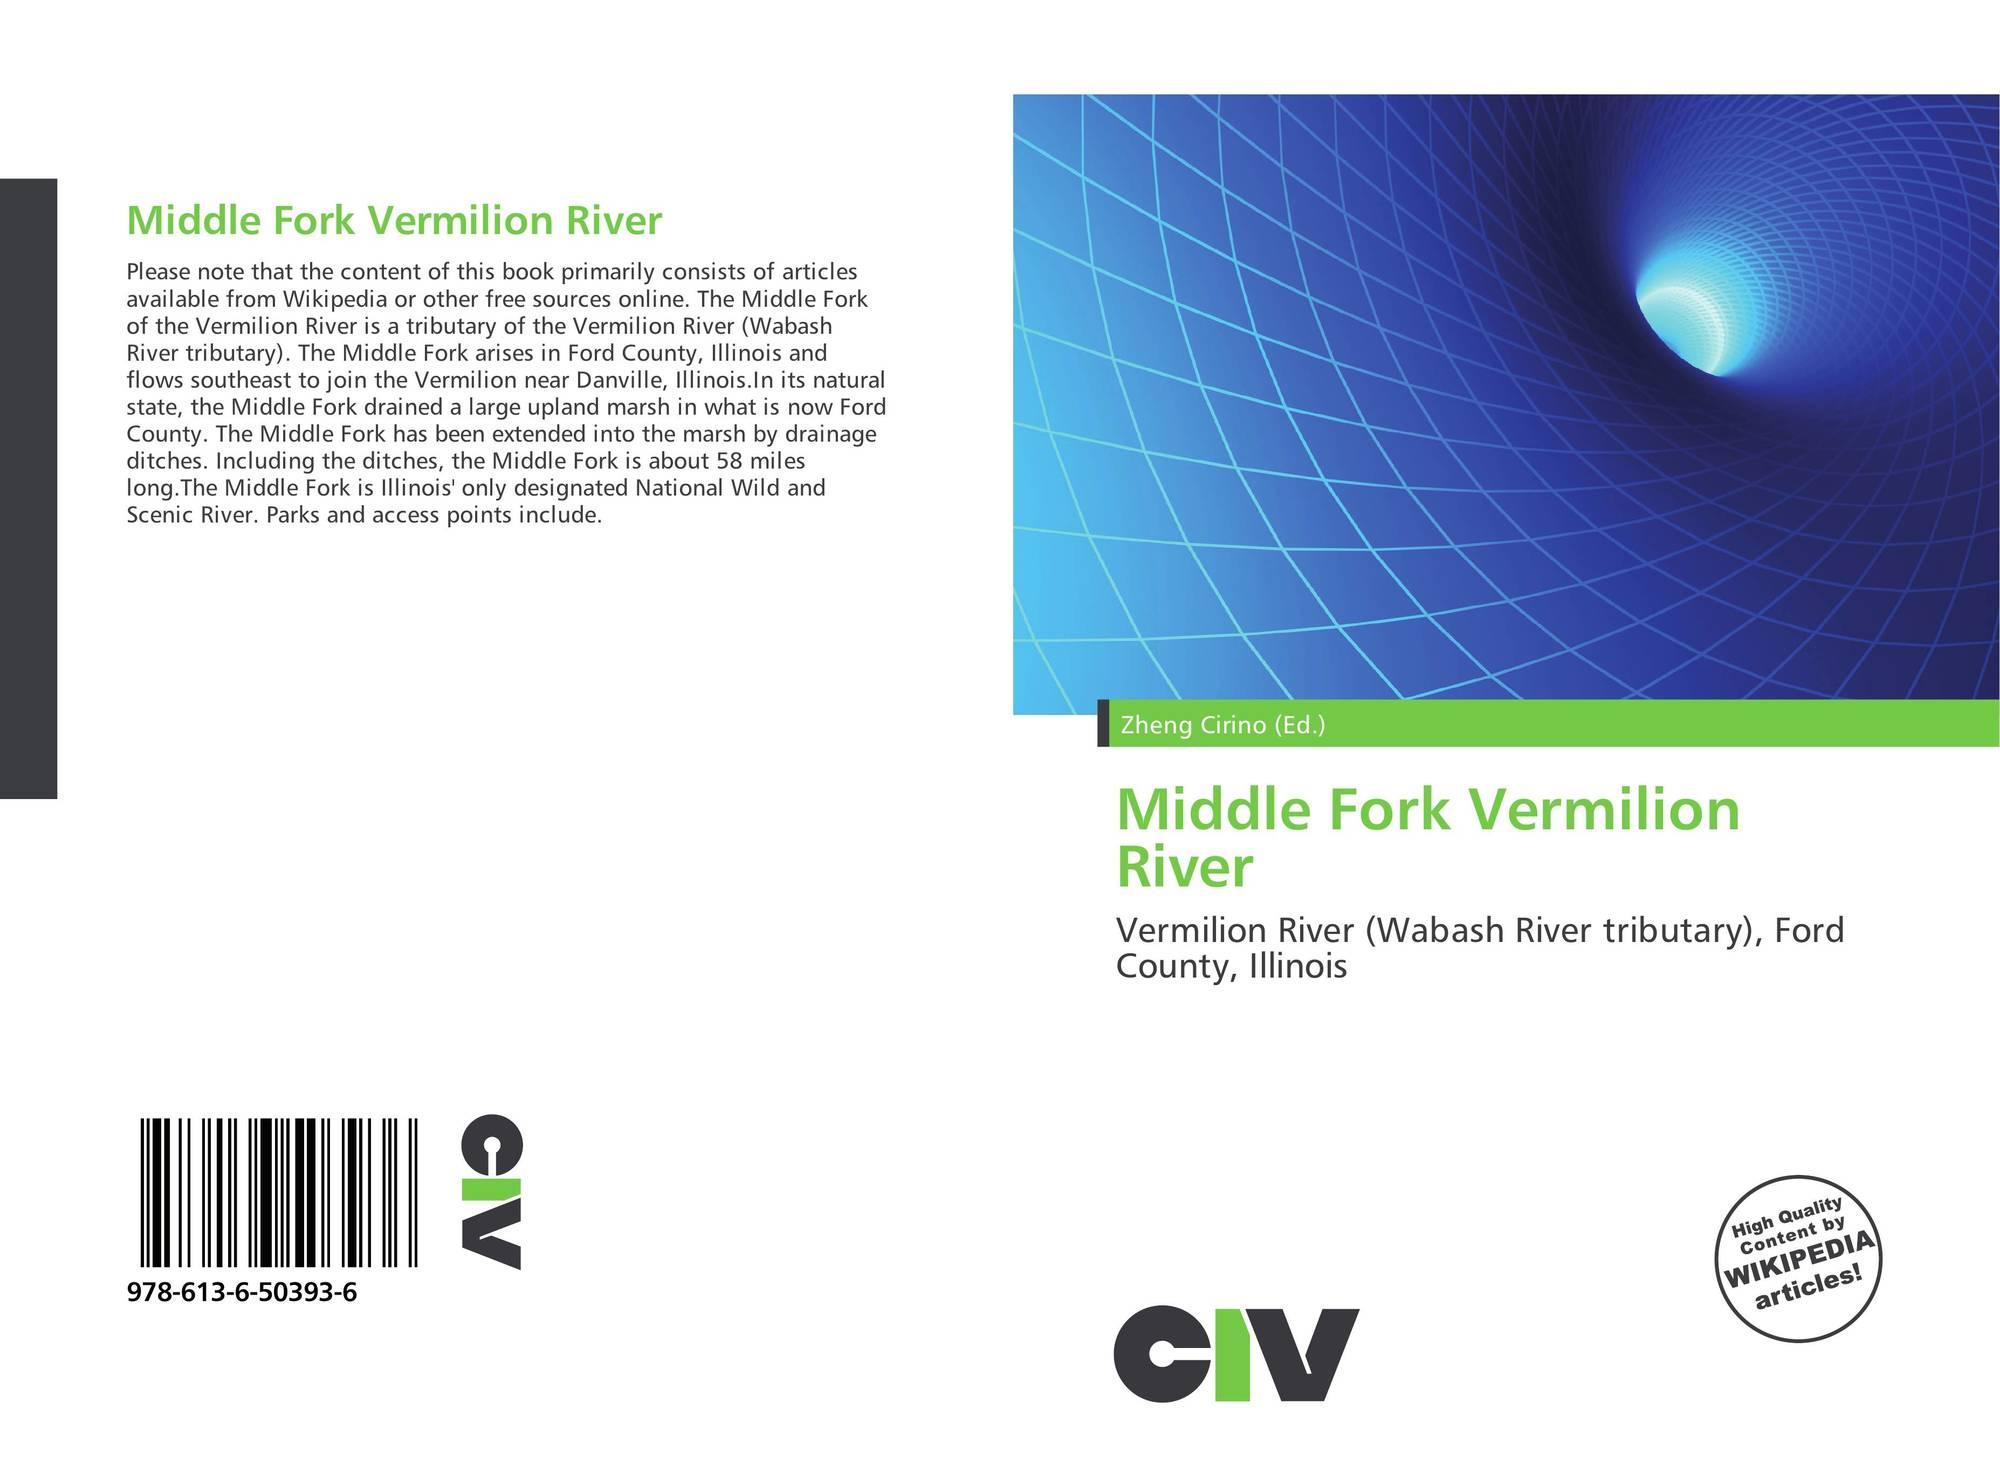 Illinois vermilion county muncie - Bookcover Of Middle Fork Vermilion River Omni Badge 9307e2201e5f762643a64561af3456be64a87707602f96b92ef18a9bbcada116